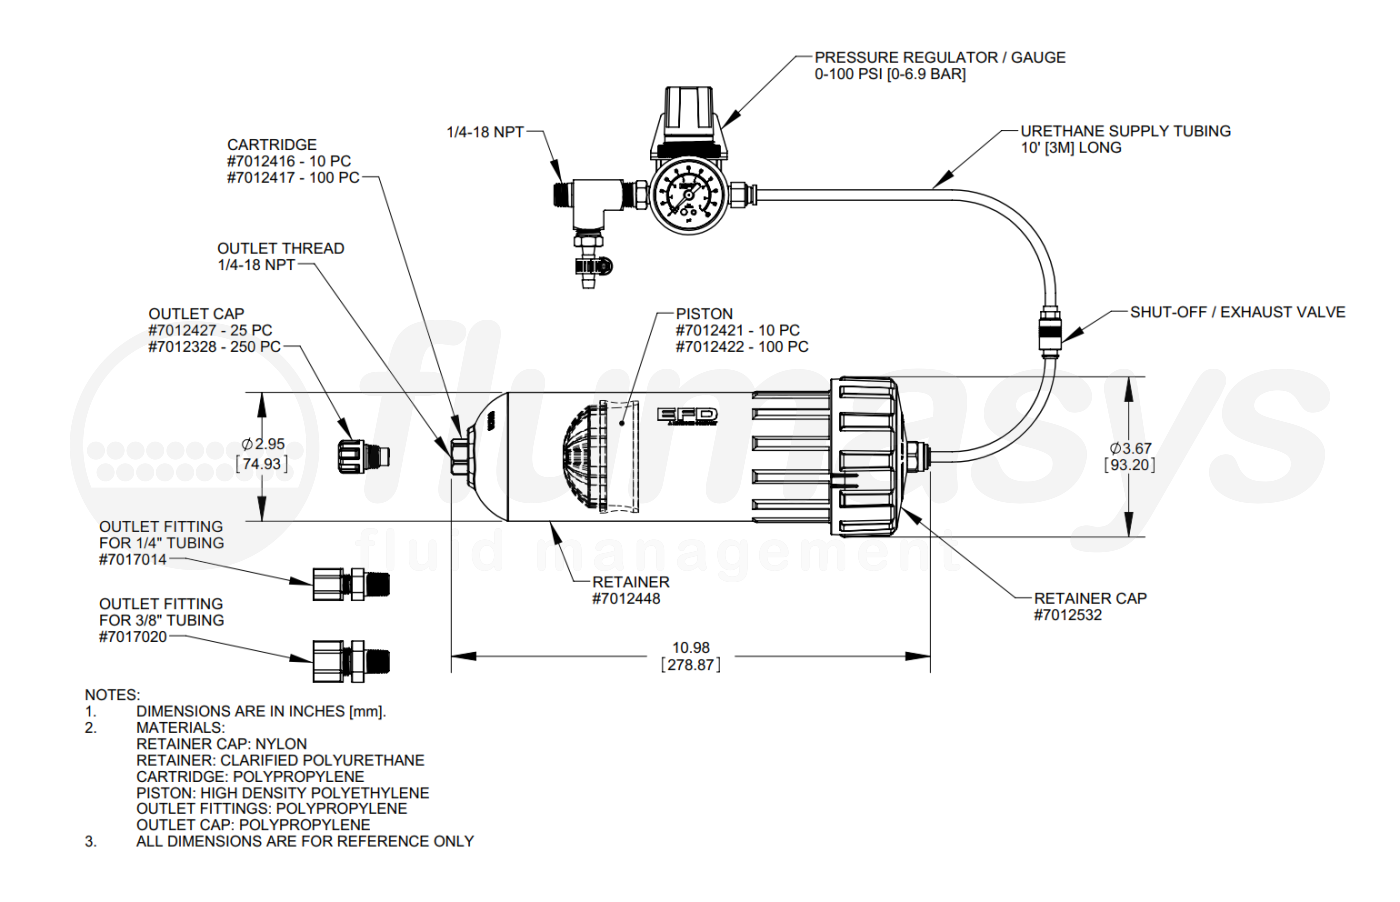 7012440_NordsonEFD_Optimum_retainer_system_20OZ_0-7bar_drawing